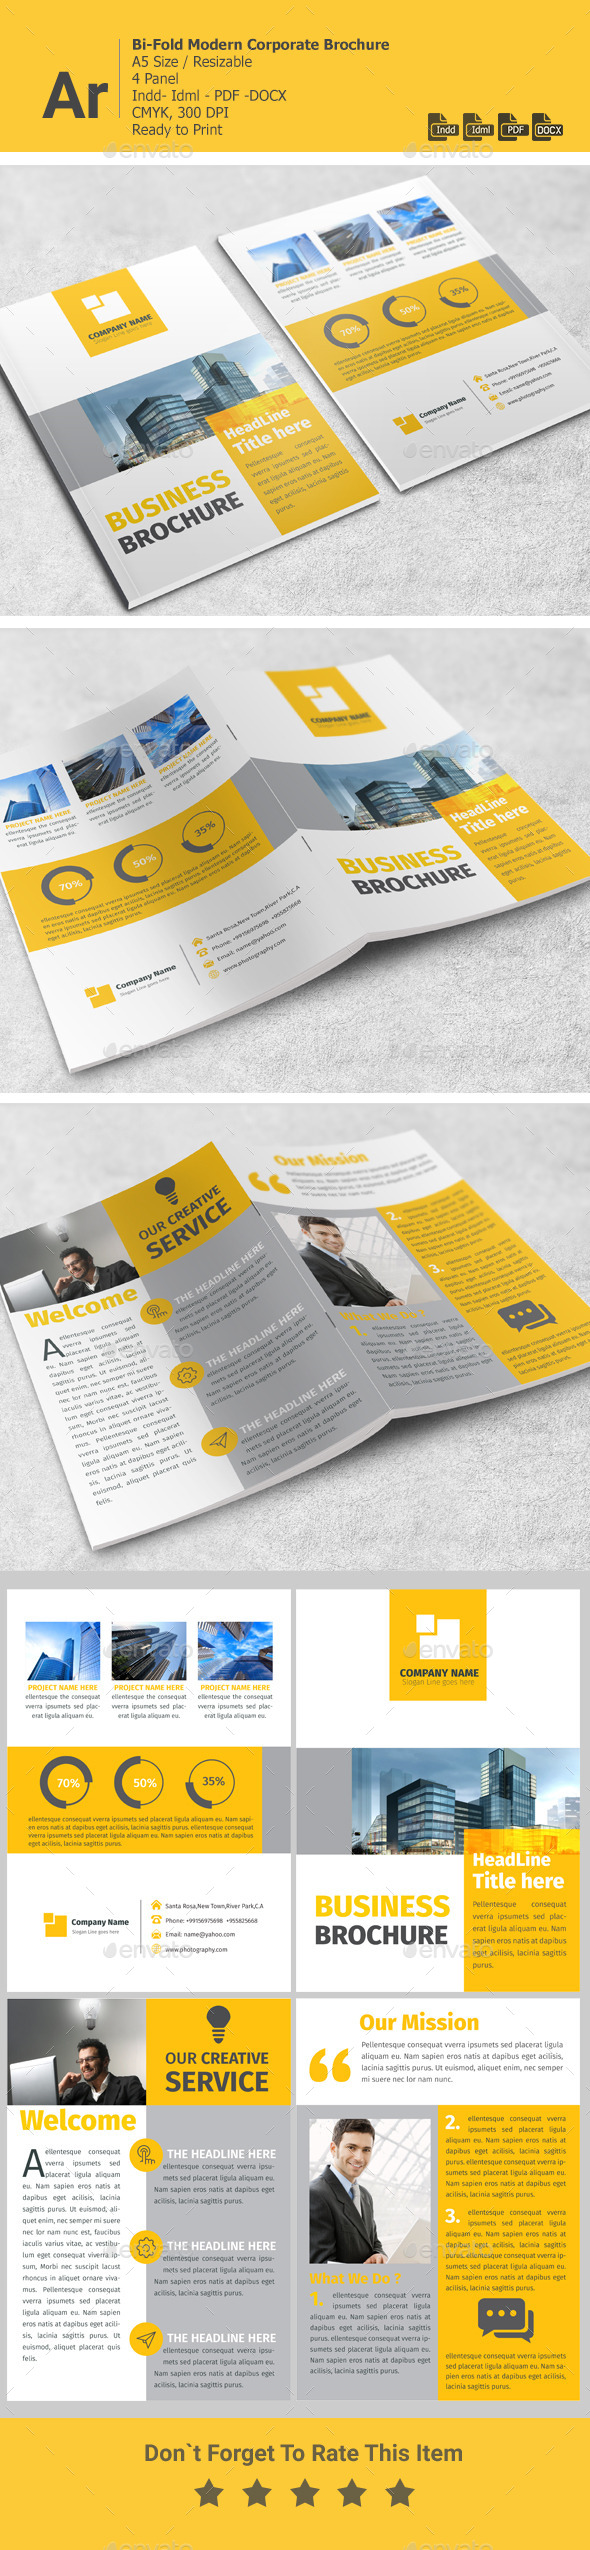 GraphicRiver Bi-Fold Corporate Brochure A5 11320289